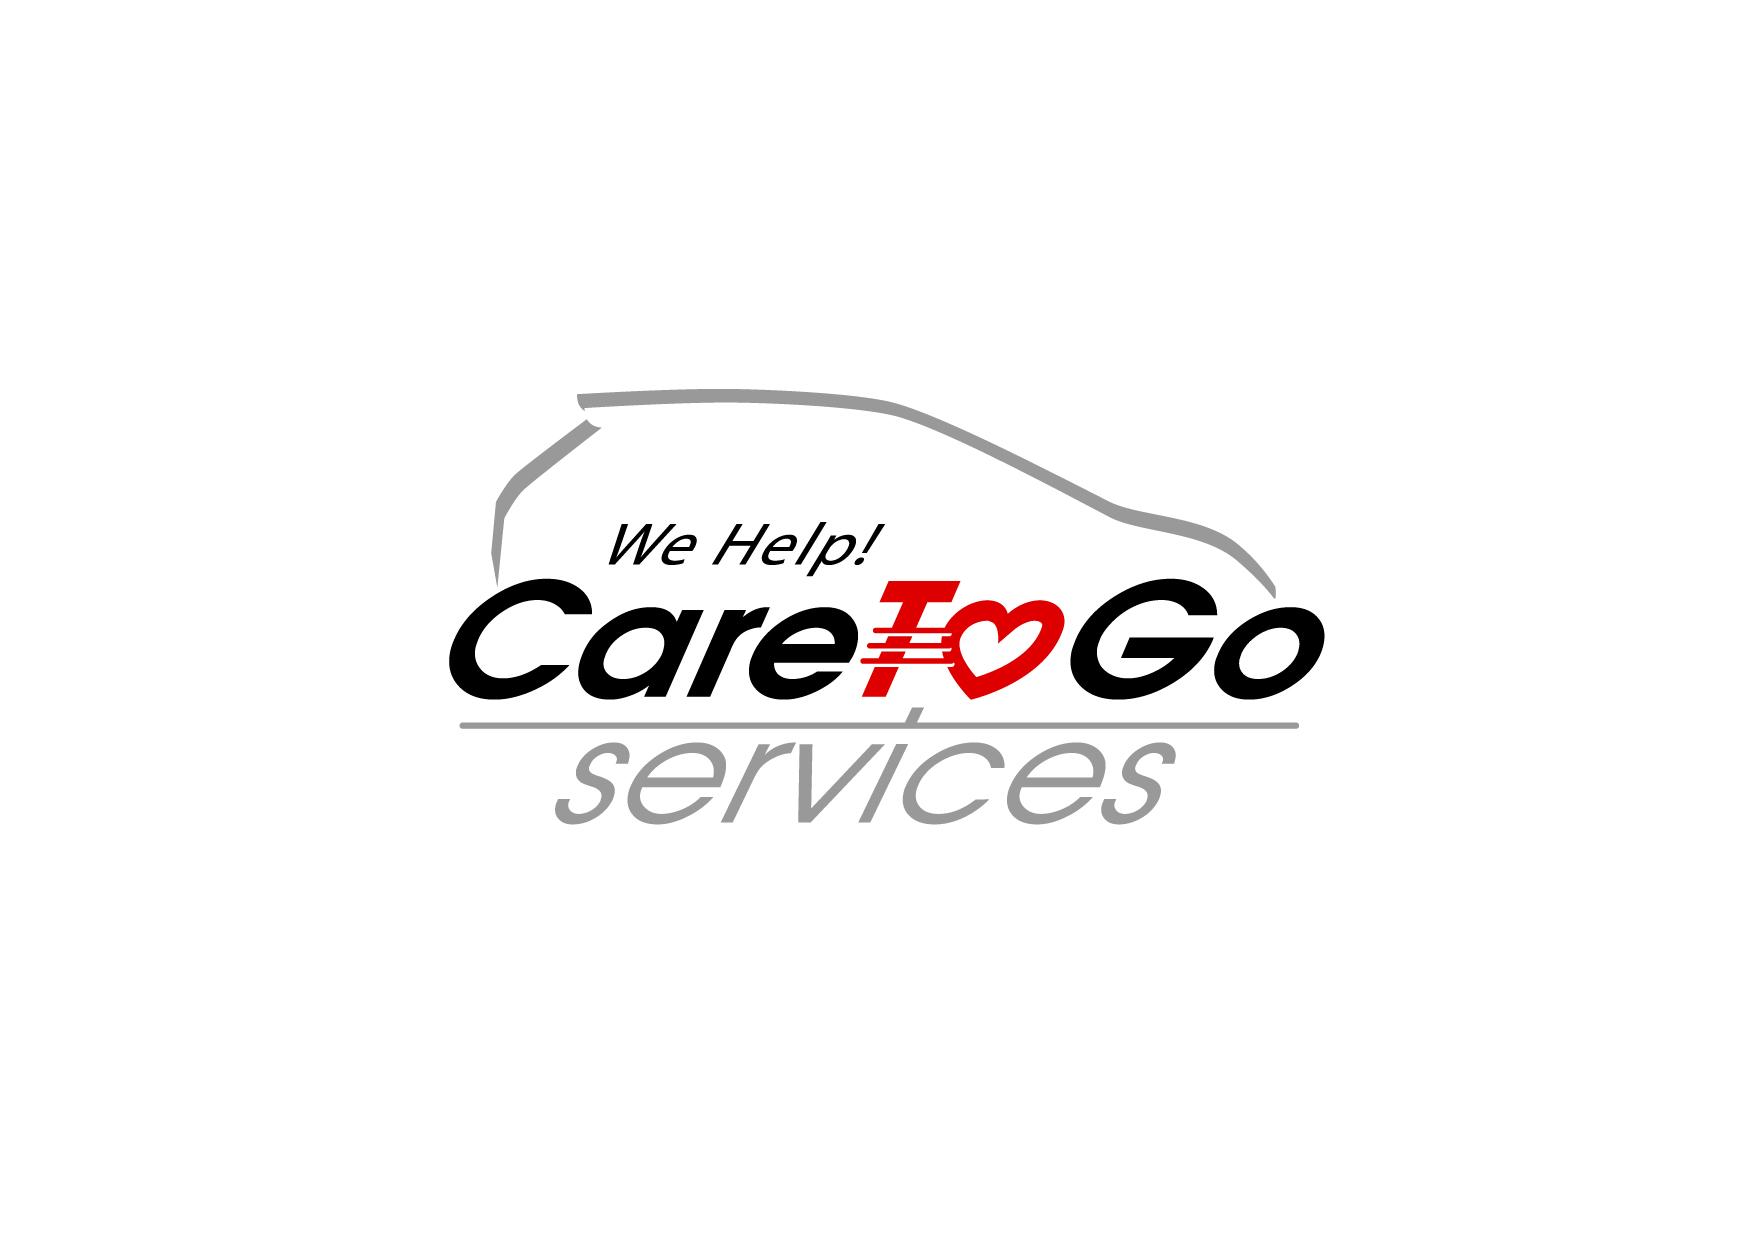 Logo Design by Wilfredo Mendoza - Entry No. 181 in the Logo Design Contest Care To Go Services.